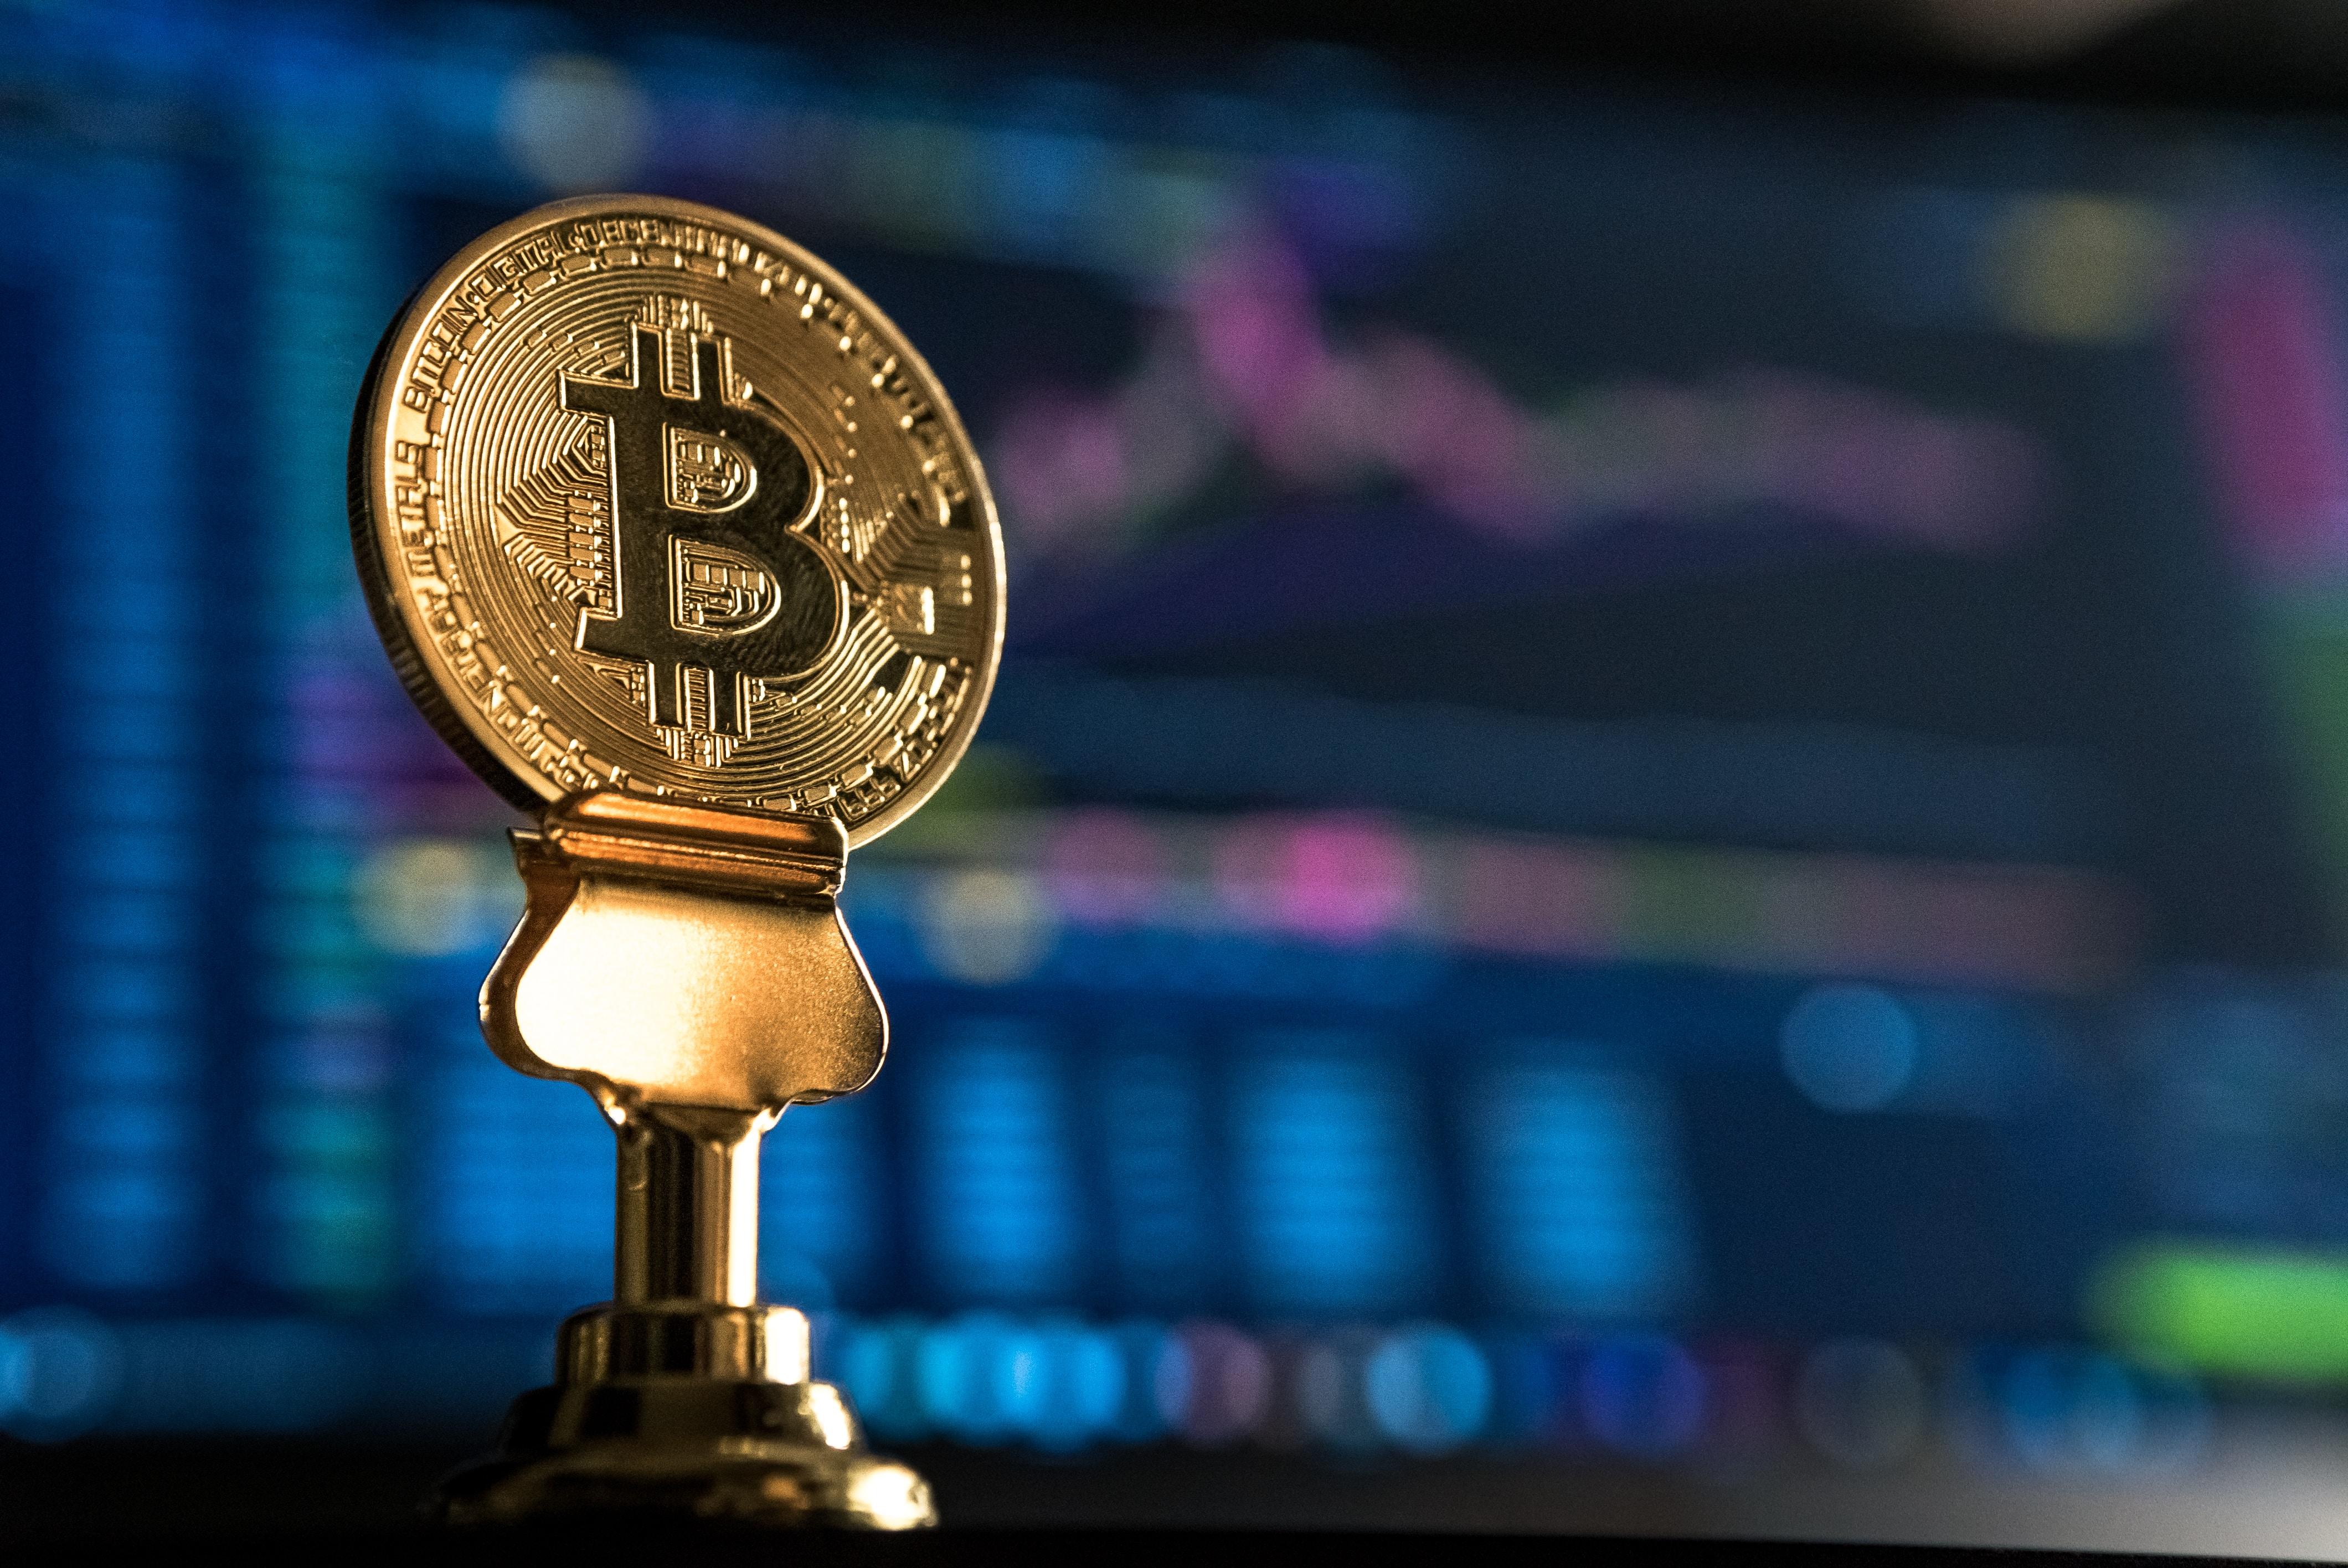 Digital Assets Weekly: April 28th, 2020